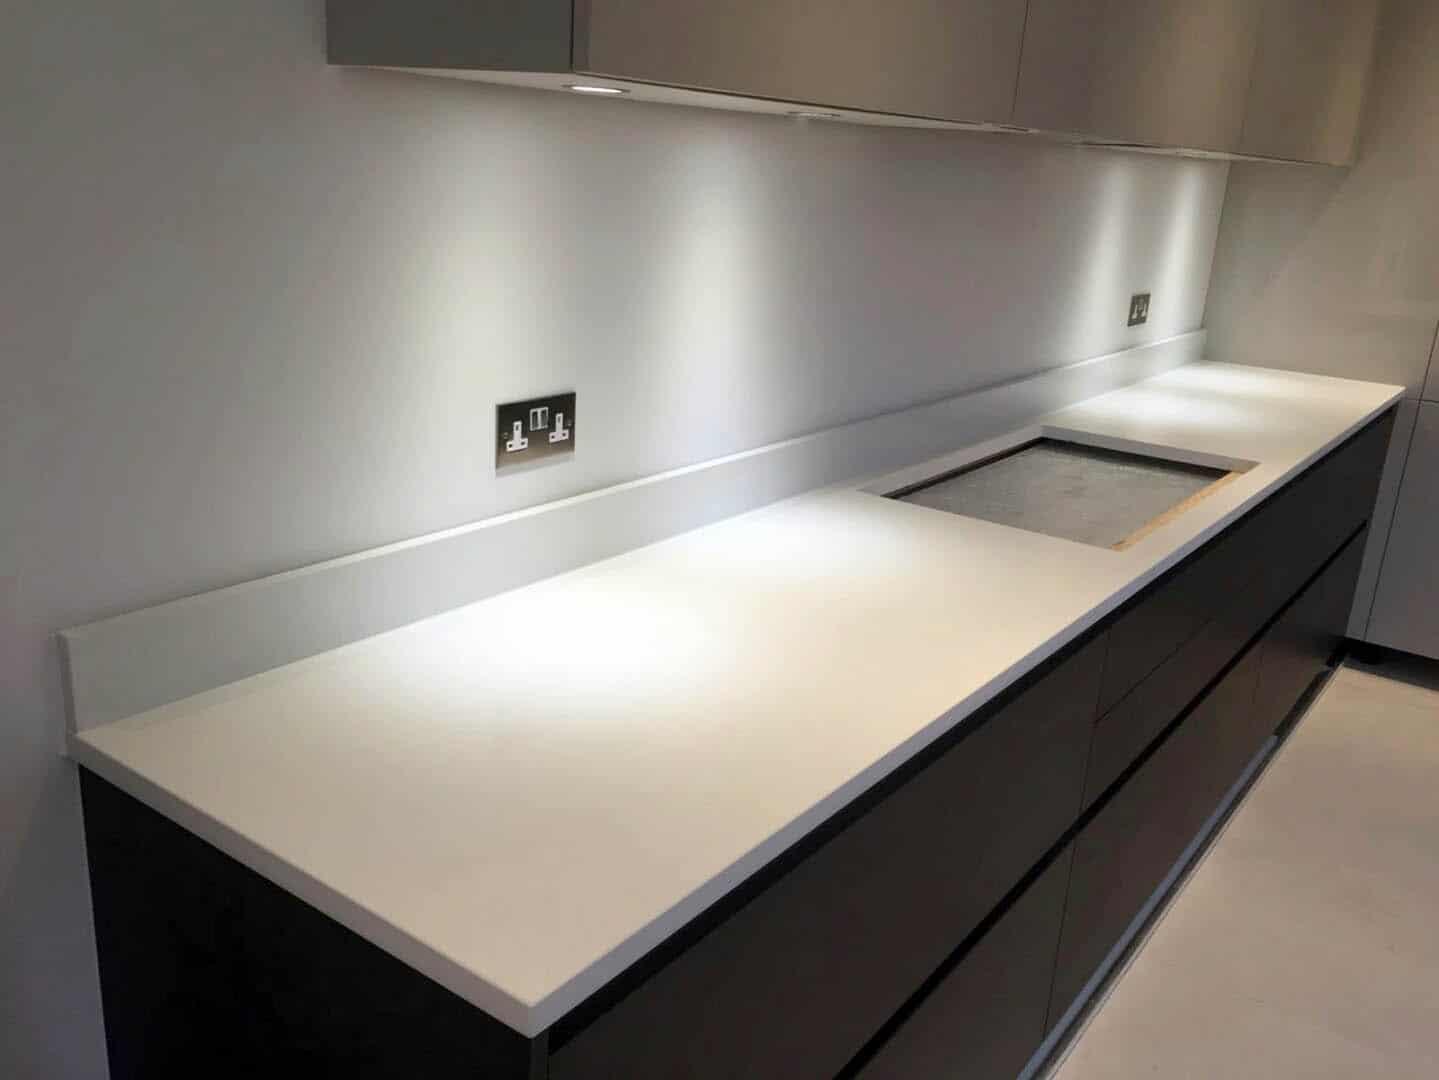 Bianco Marmo Suprema - Potters Bar - Rock and Co Granite Ltd